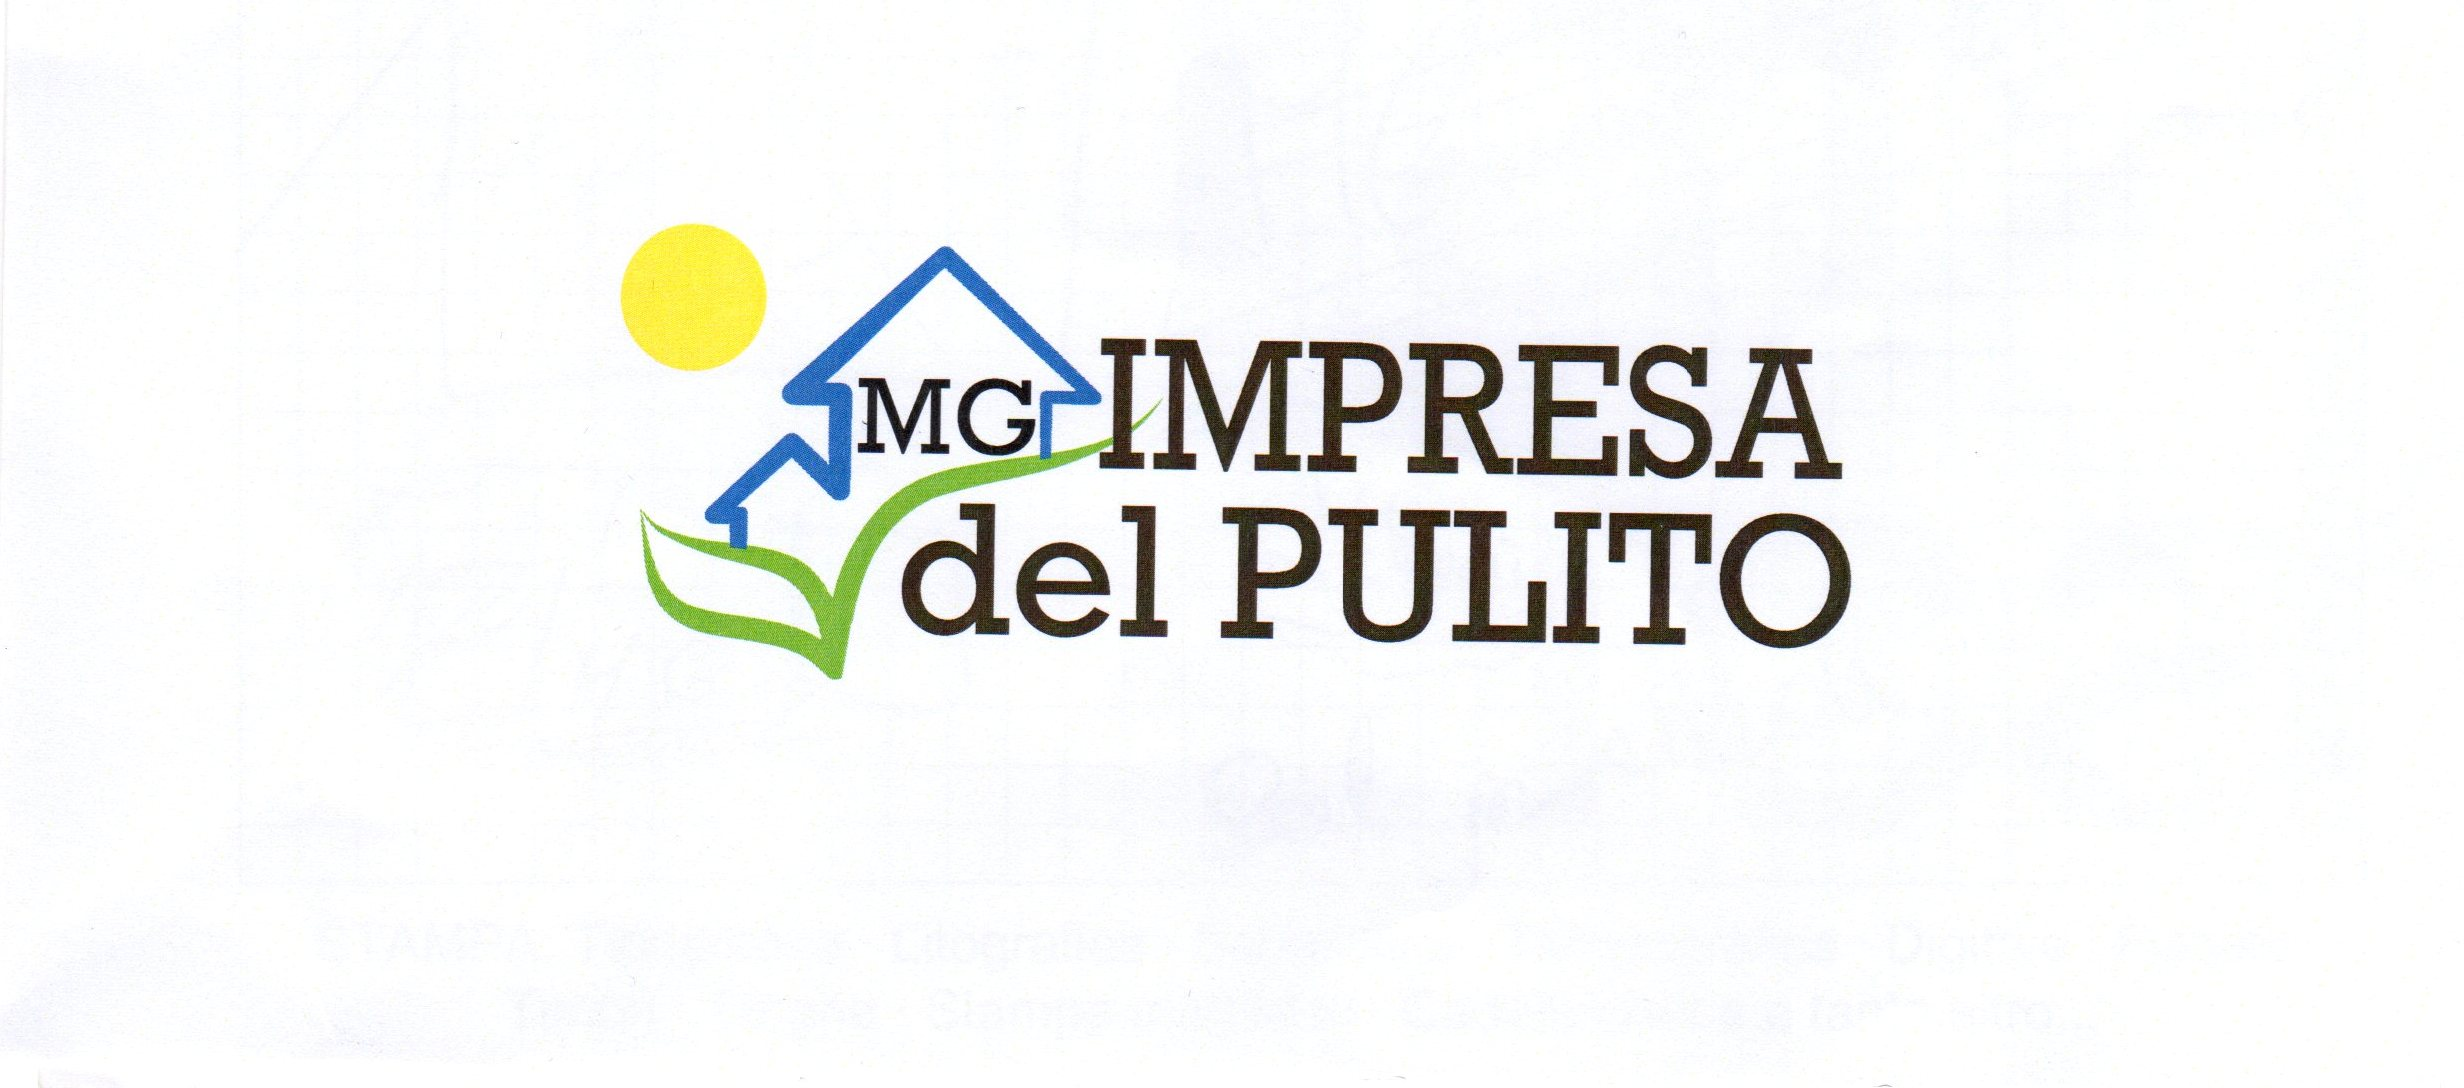 Impresa Del Pulito Mg